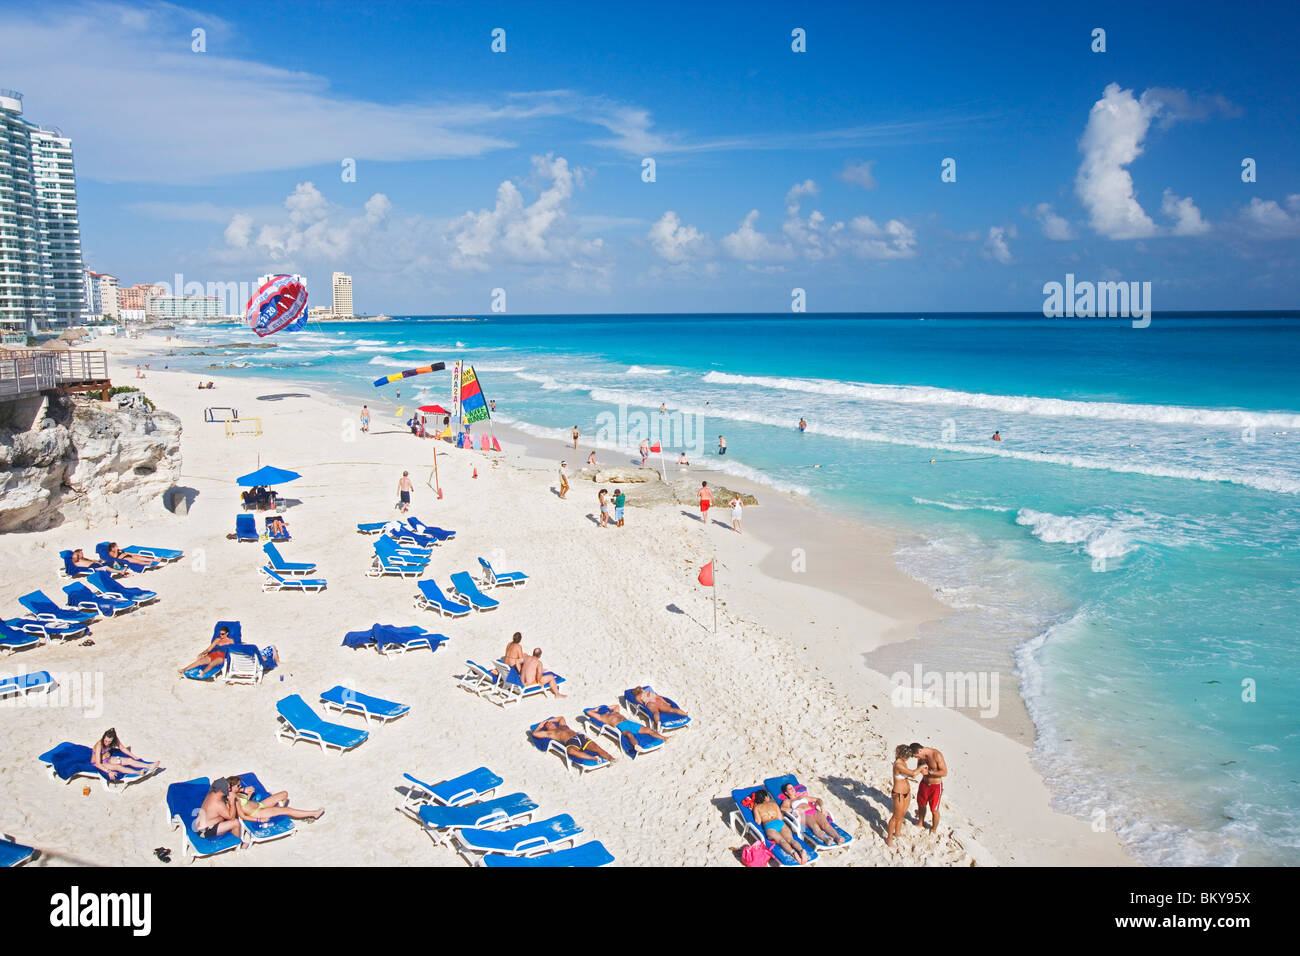 Chac-Mool beach, Cancun, State of Quintana Roo, Peninsula Yucatan, Mexico - Stock Image